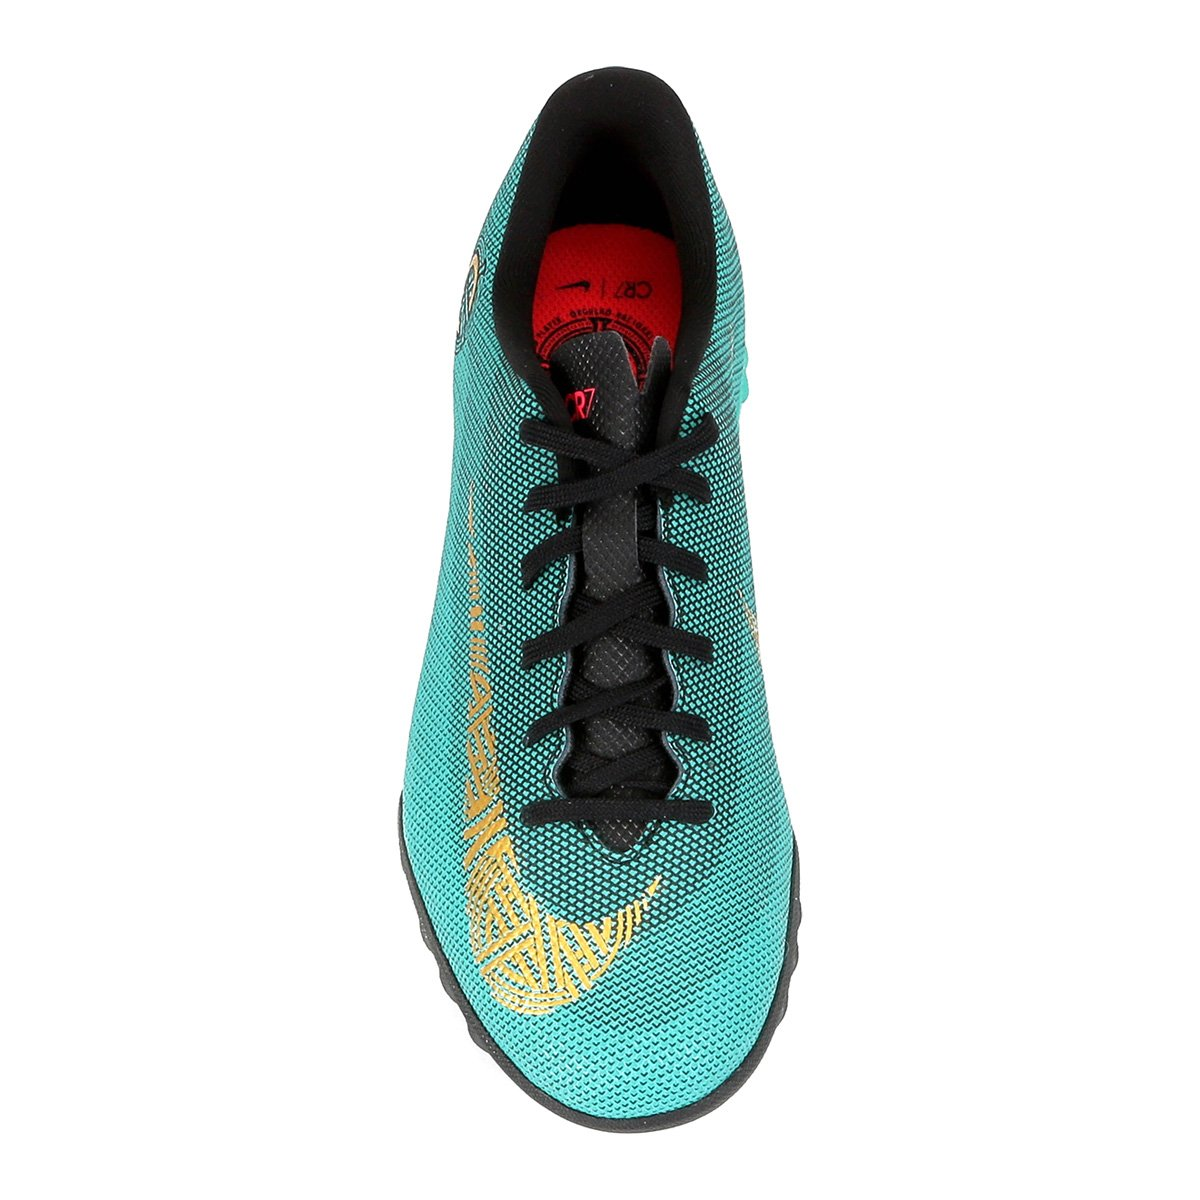 Chuteira Society Infantil Nike Mercurial Vapor 12 Academy GS CR7 TF ... 29e6f8ae8a8f9